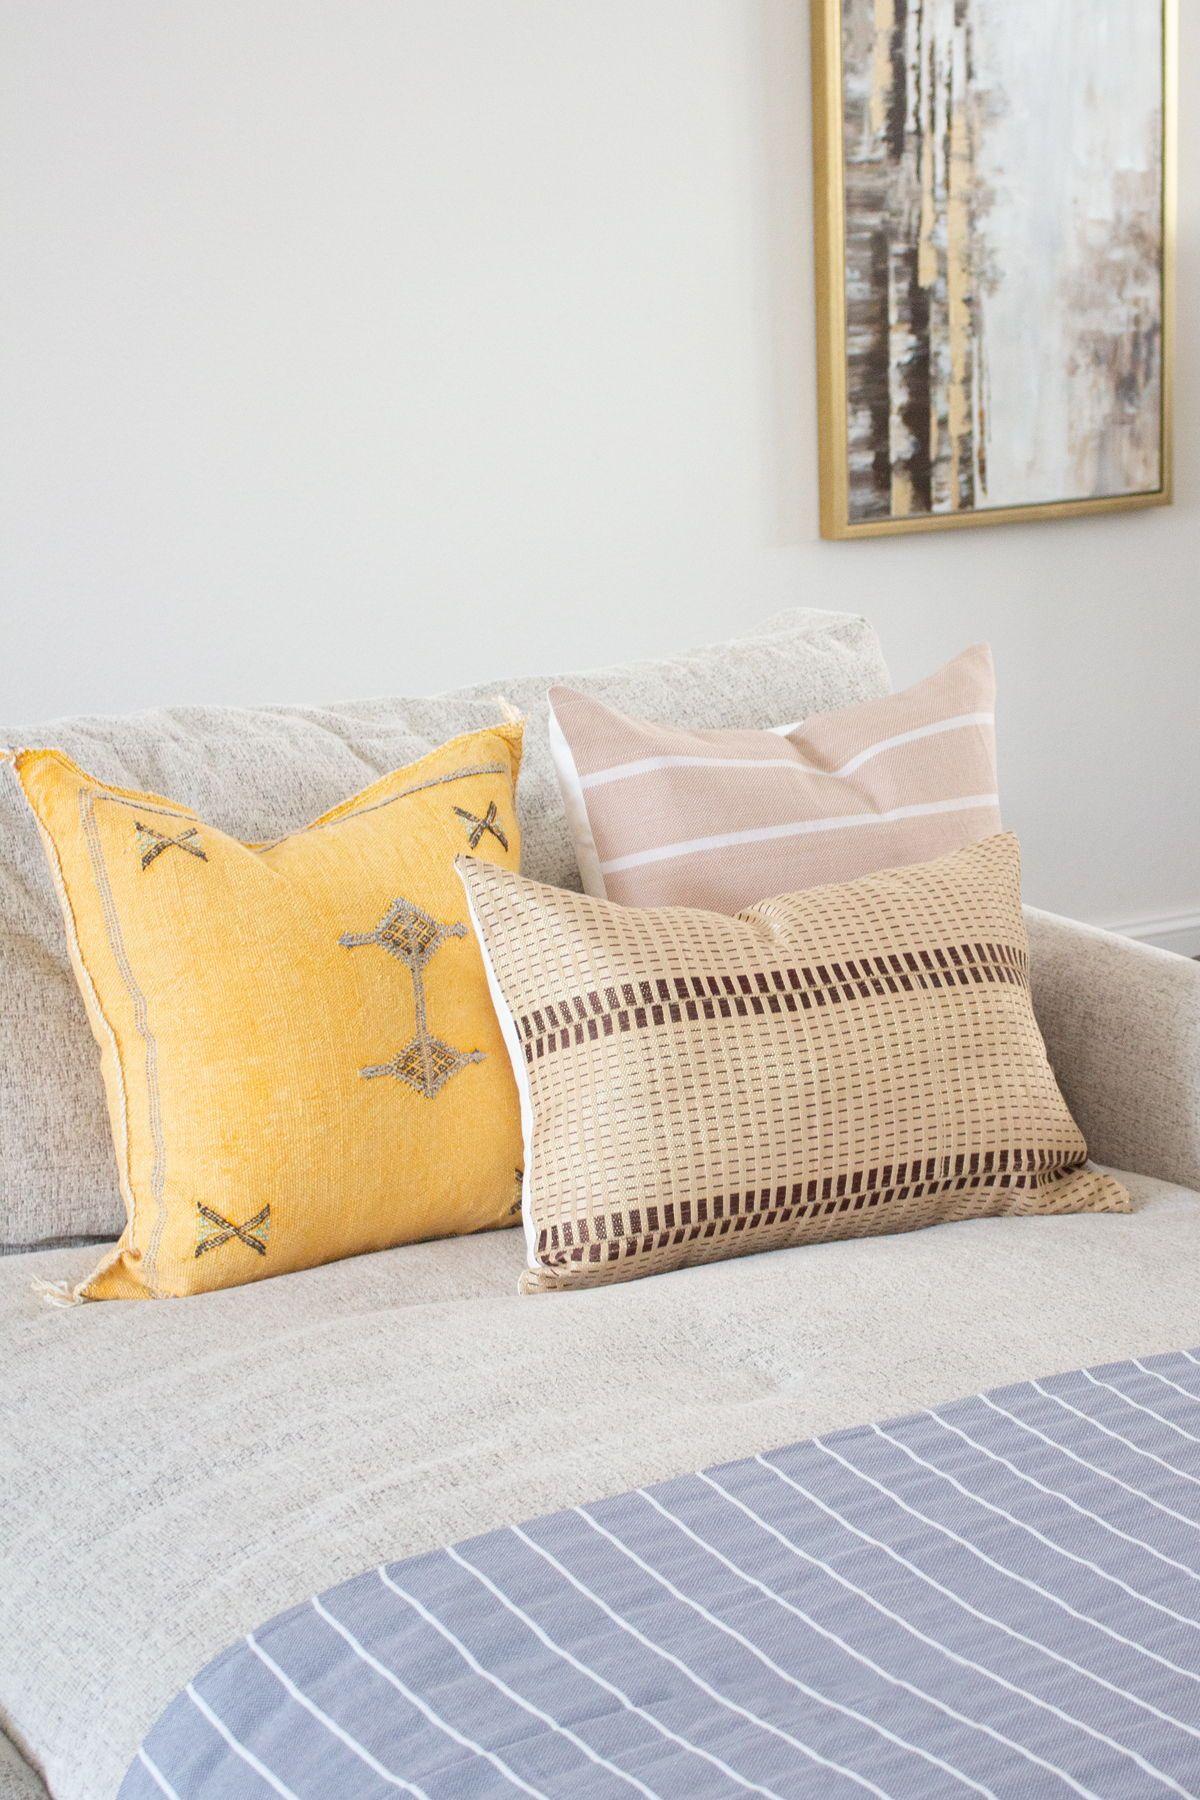 African Handwoven Textured Lumbar Throw Pillow Cover